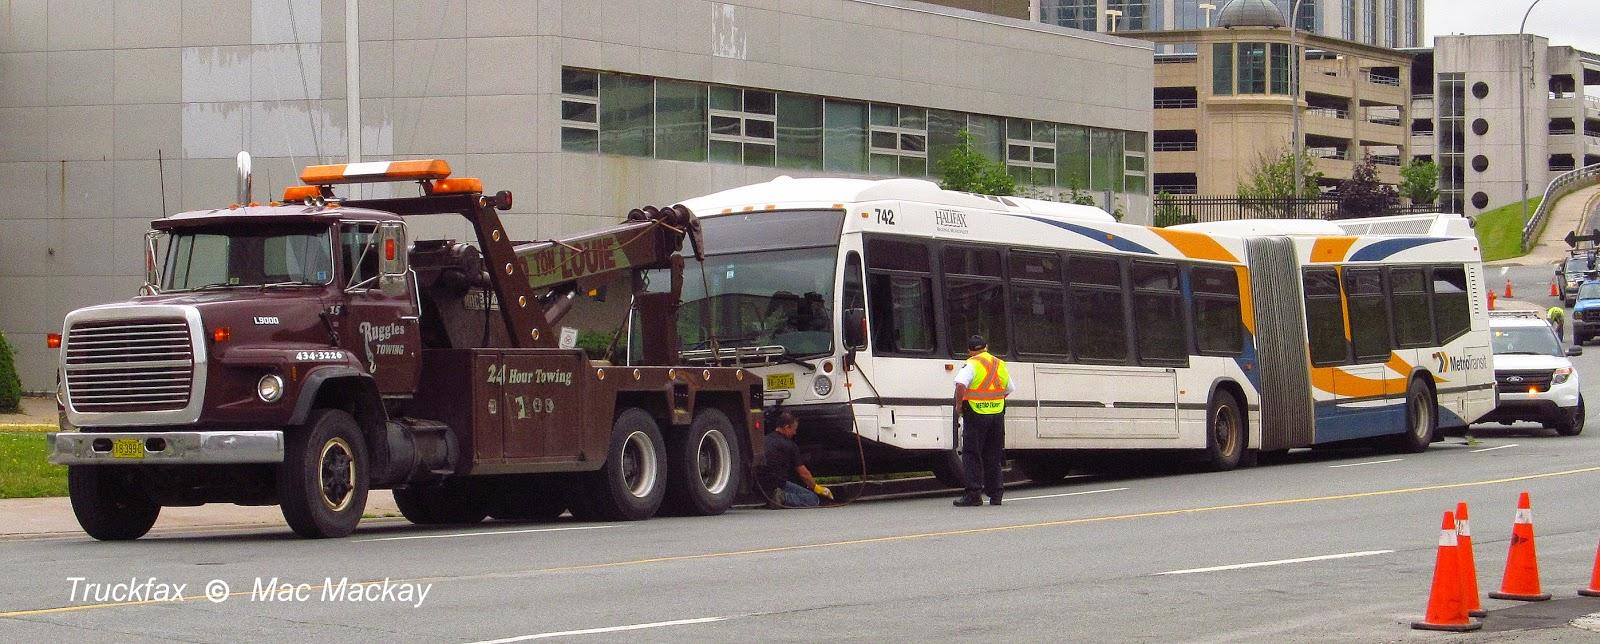 Halifax's bus maintenance needs an overhaul